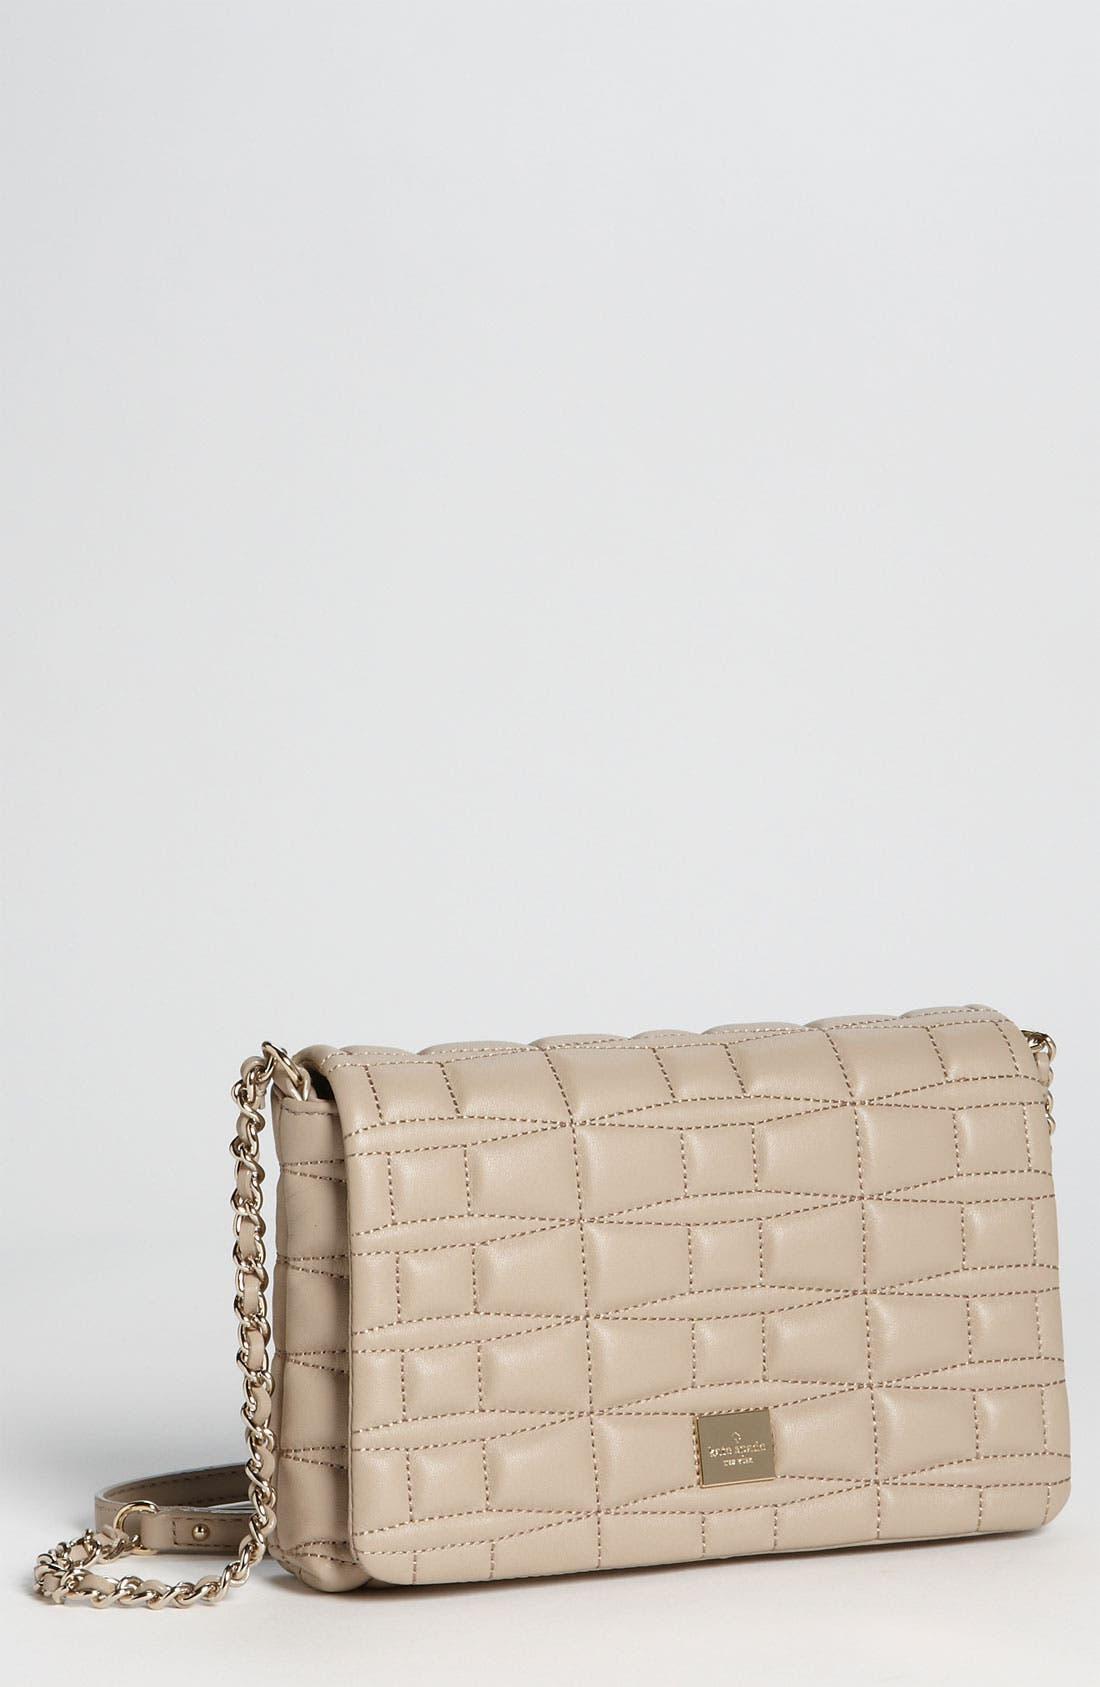 Main Image - kate spade new york 'brianne' crossbody bag